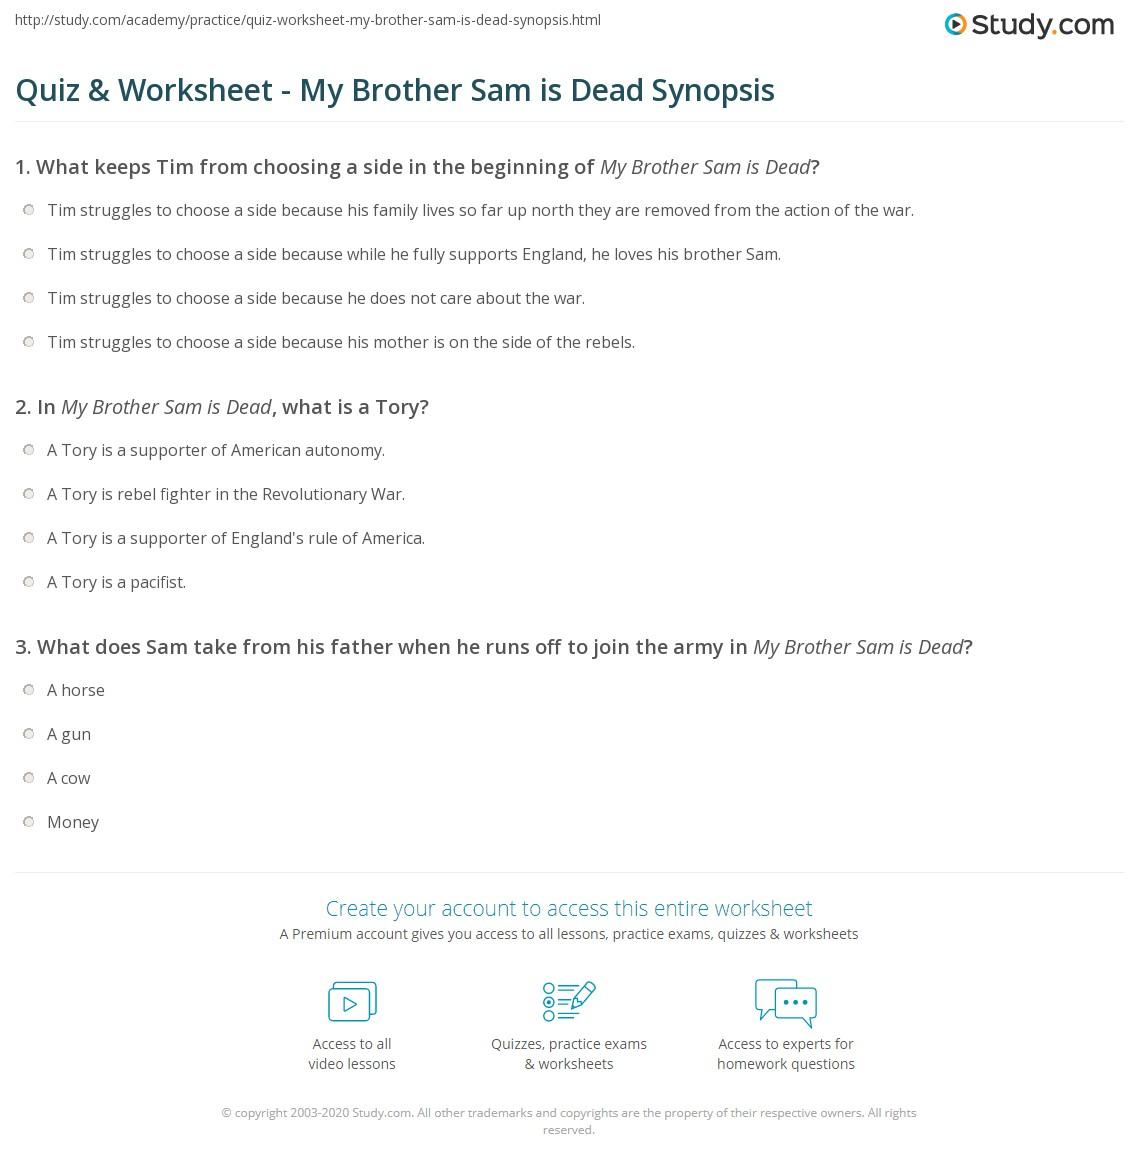 Worksheets Total Money Makeover Worksheets my brother sam is dead worksheets switchconf quiz worksheet synopsis study com